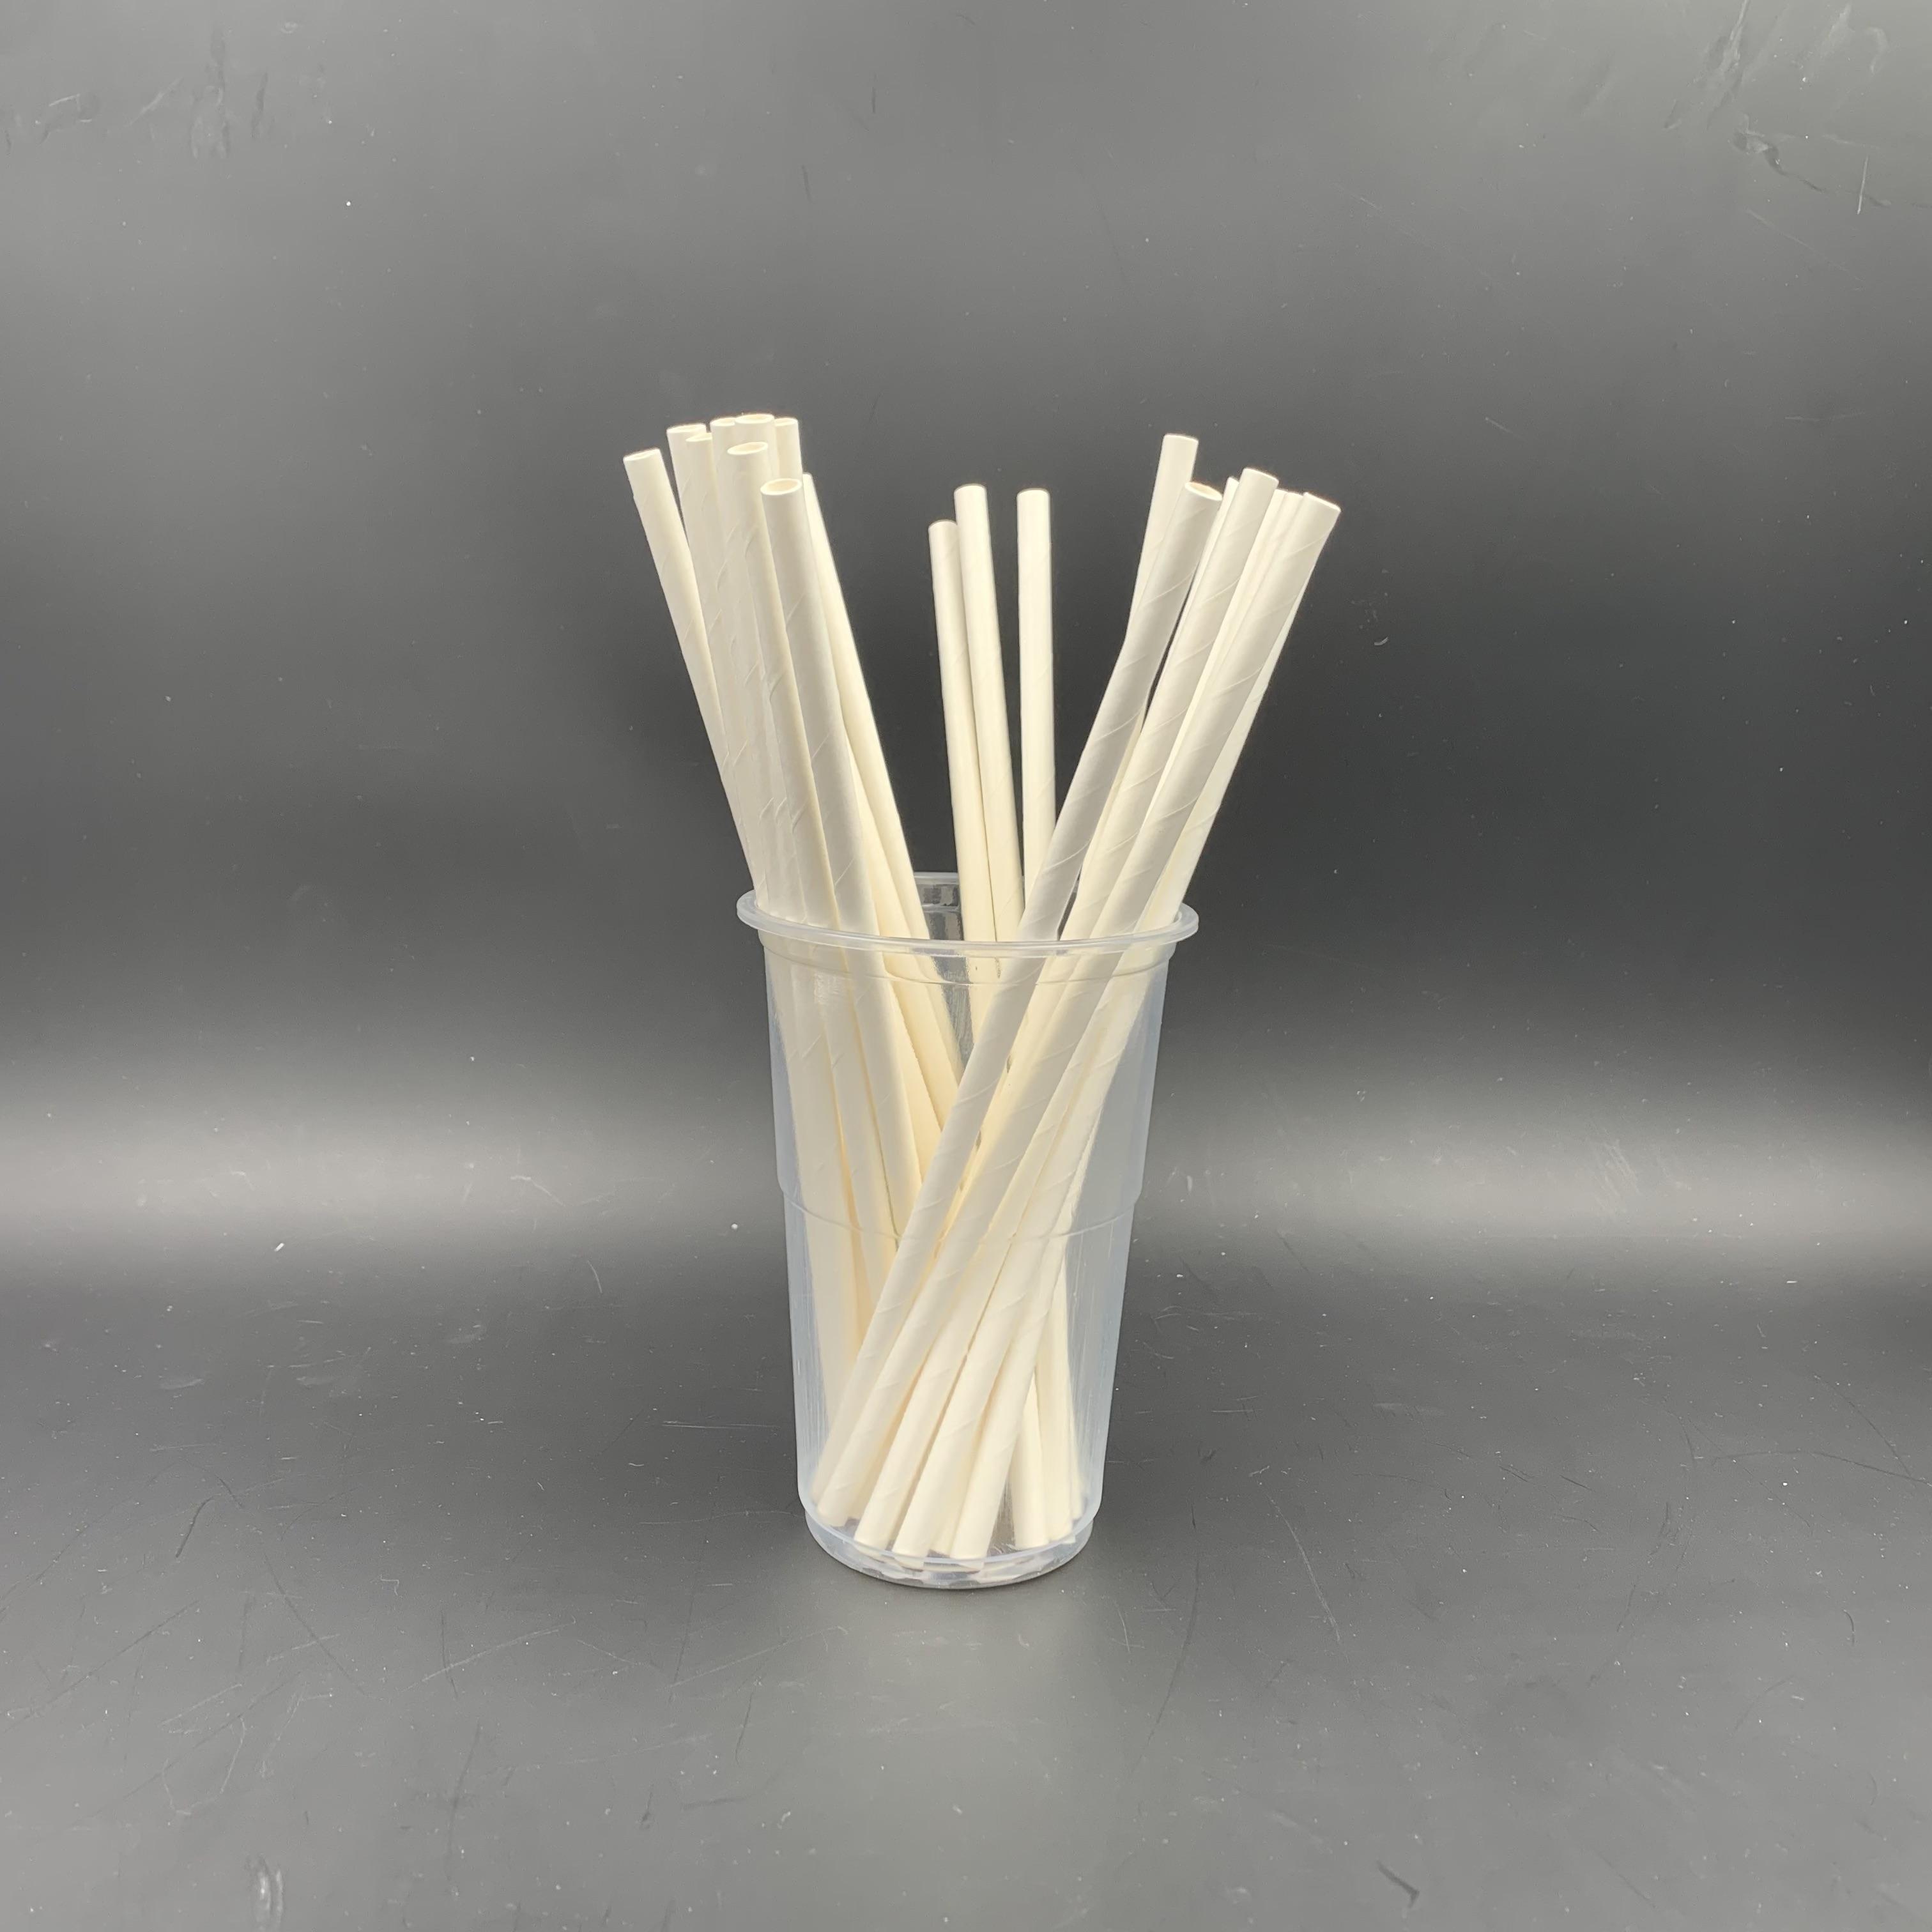 6x197mm白色紙吸管